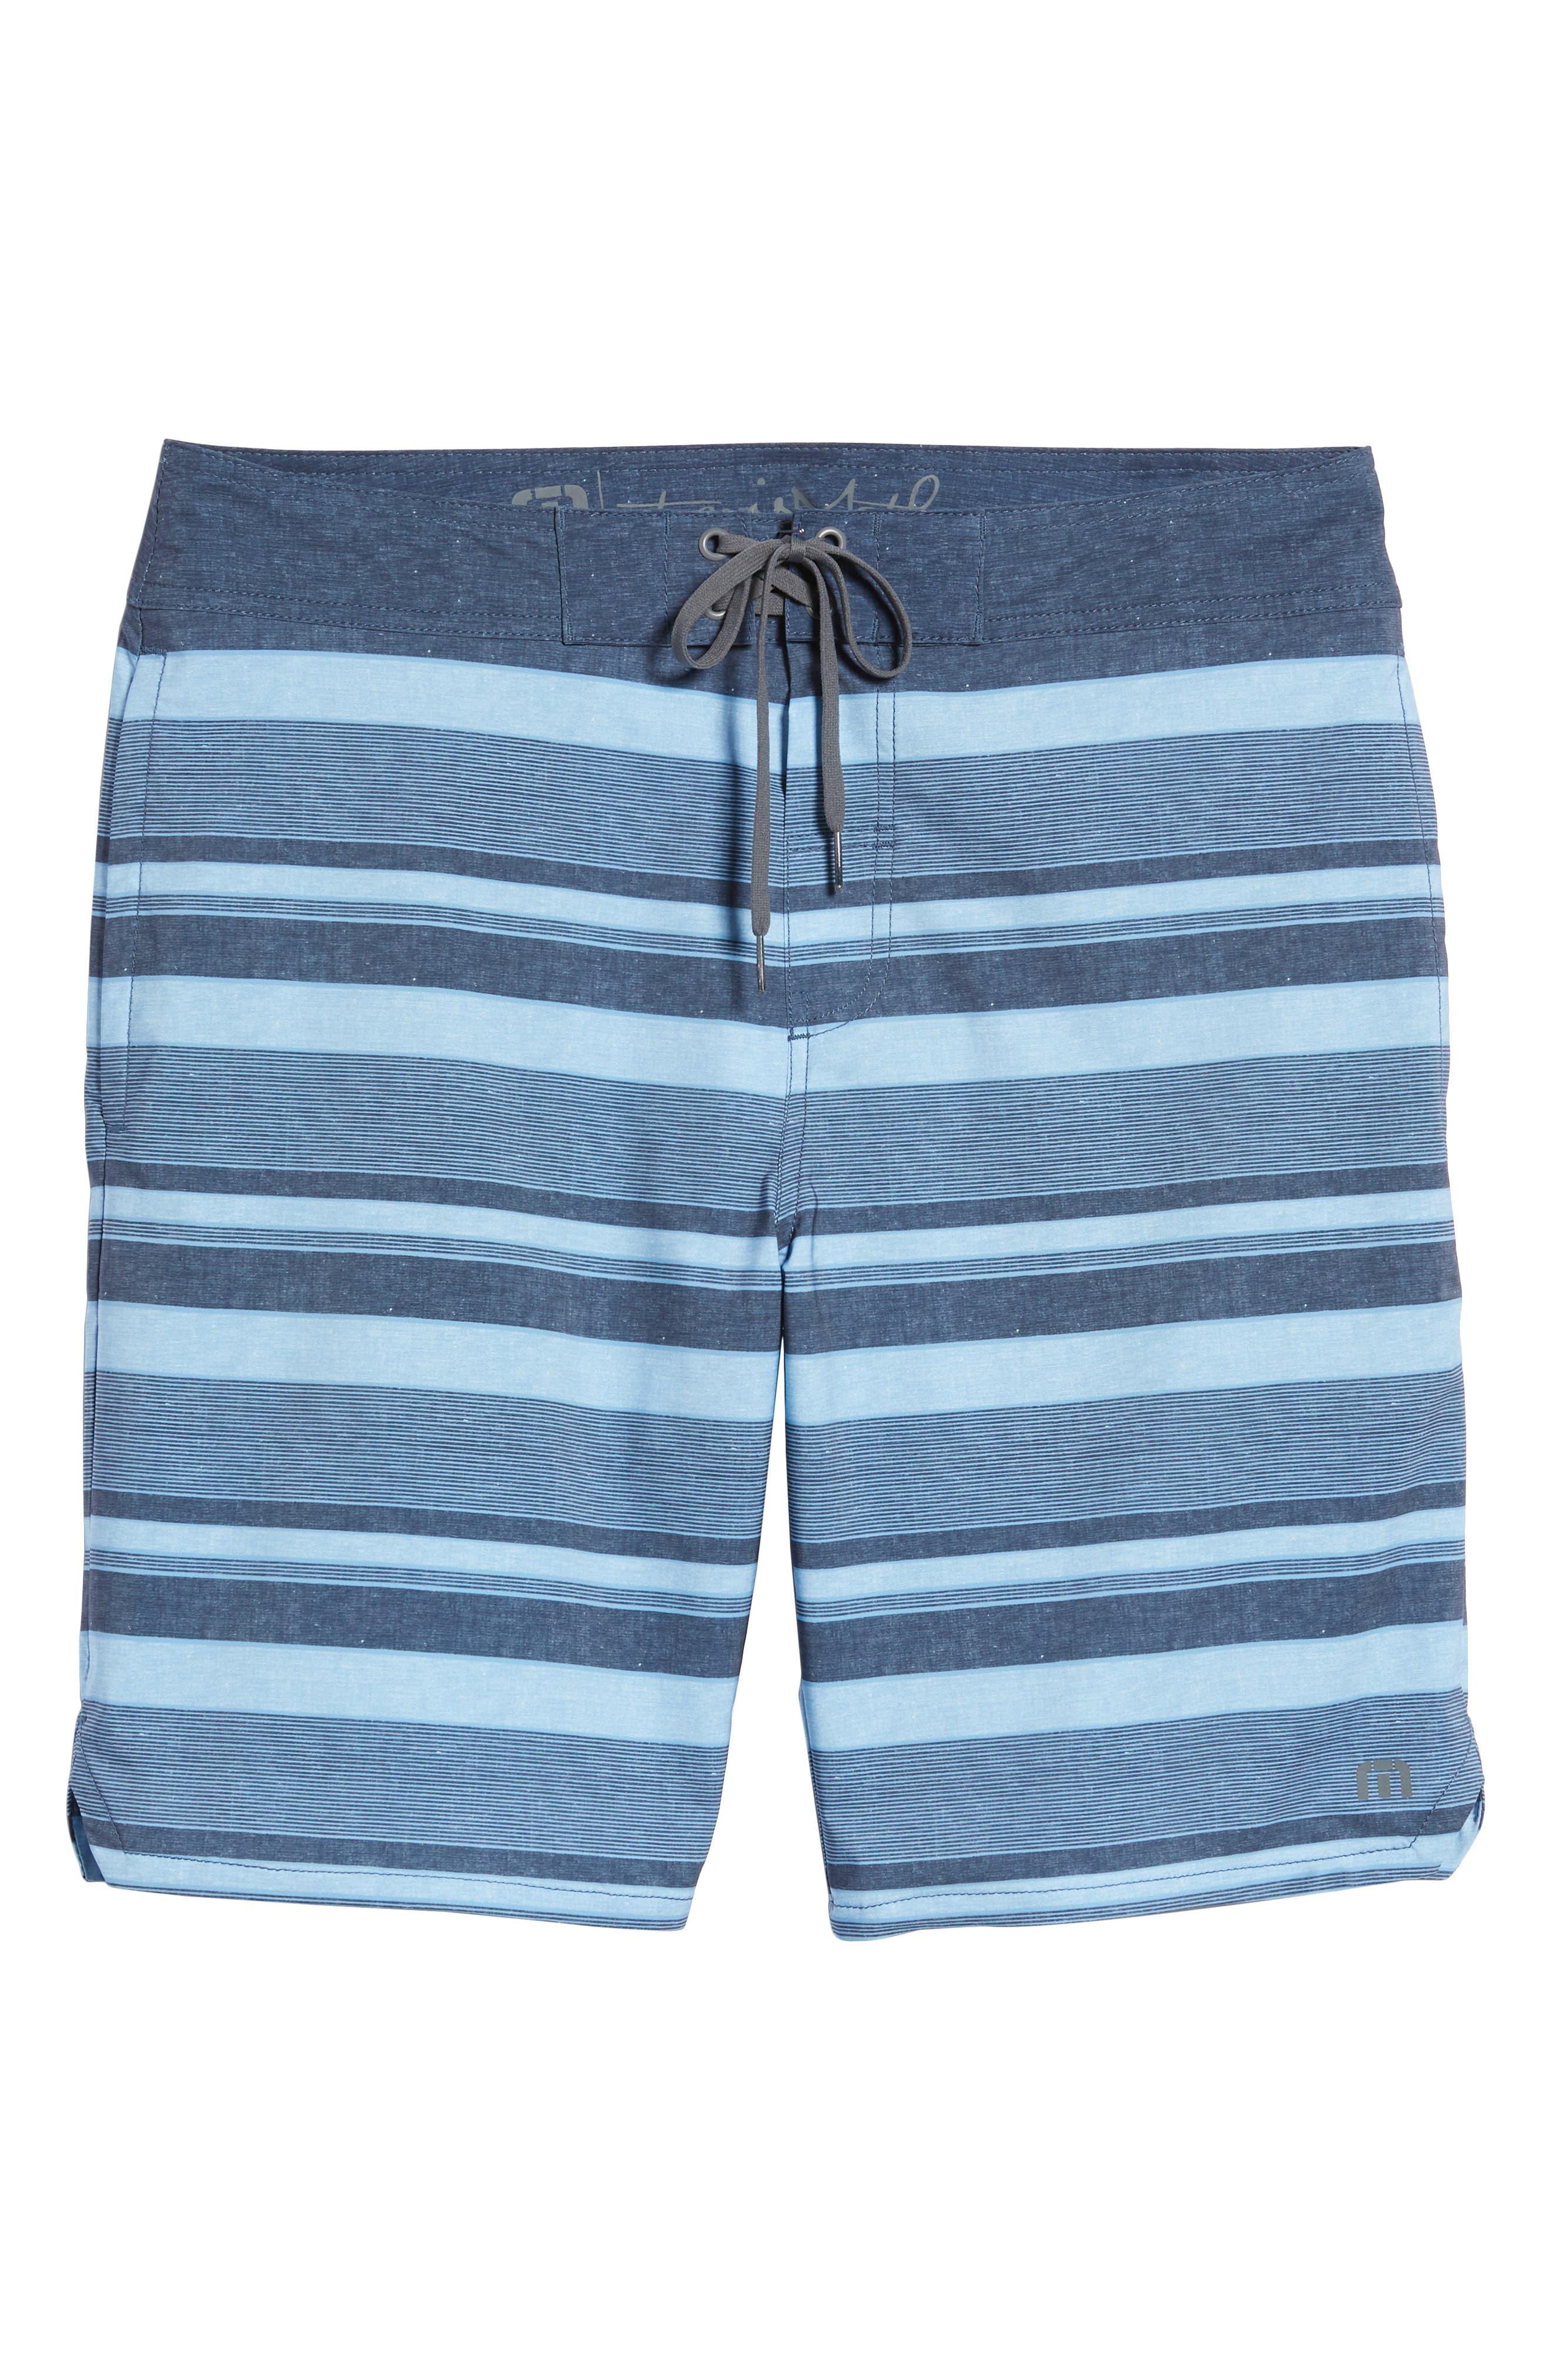 Colinas Regular Fit Board Shorts,                             Alternate thumbnail 6, color,                             HEATHER BLUESTONE